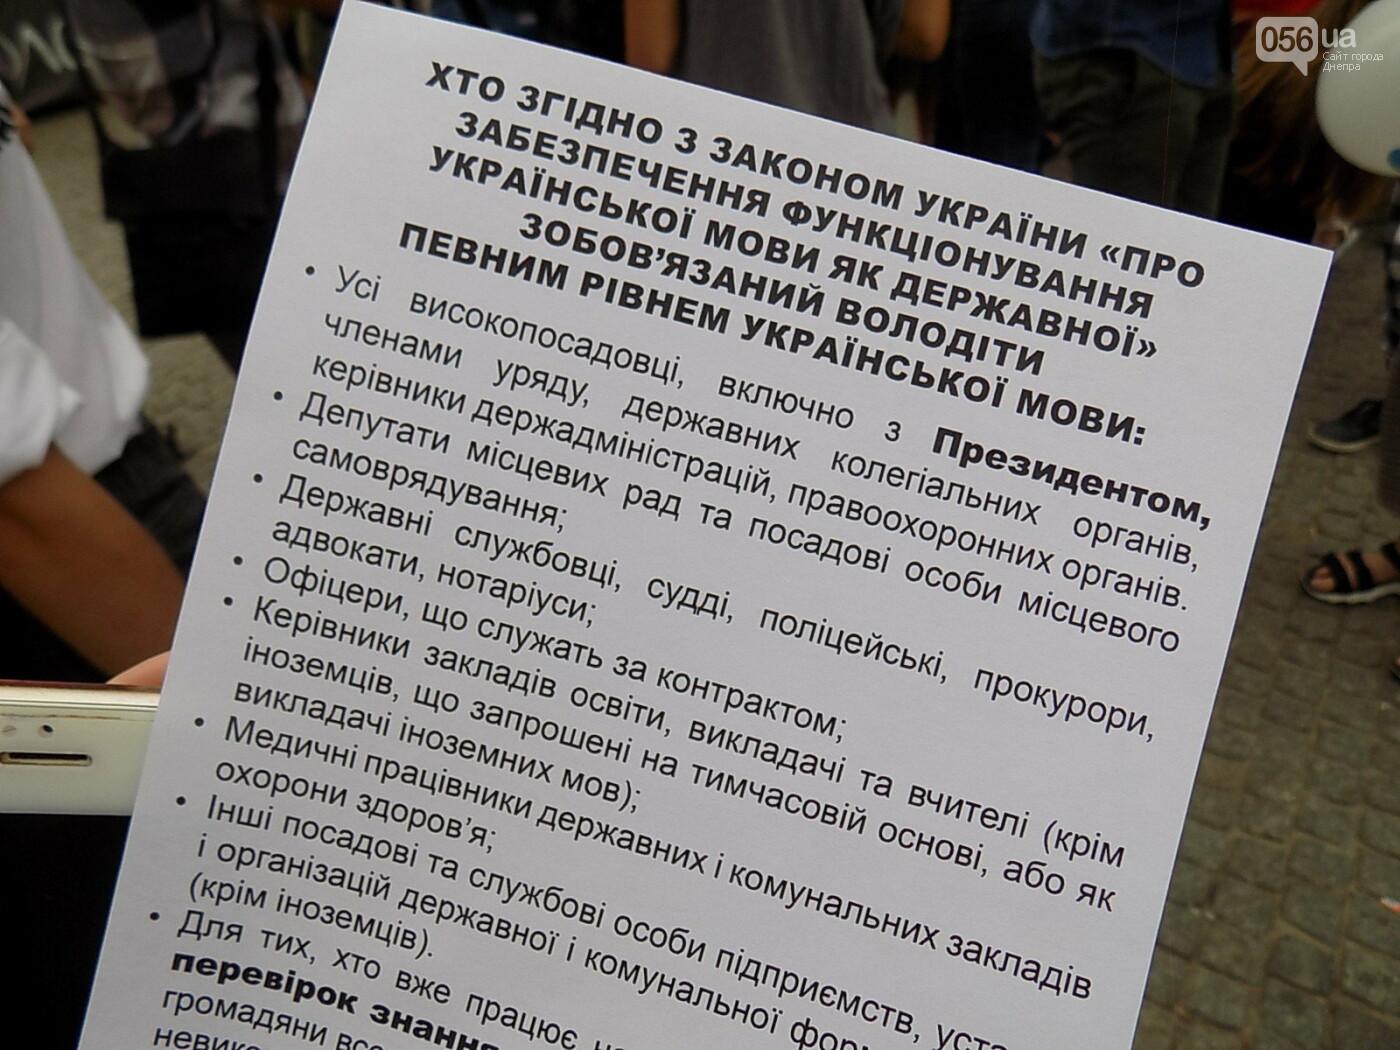 """Мова єднає Дніпро"": в центре города прошла символическая акция с концертом и подарками, - ФОТО, фото-9"